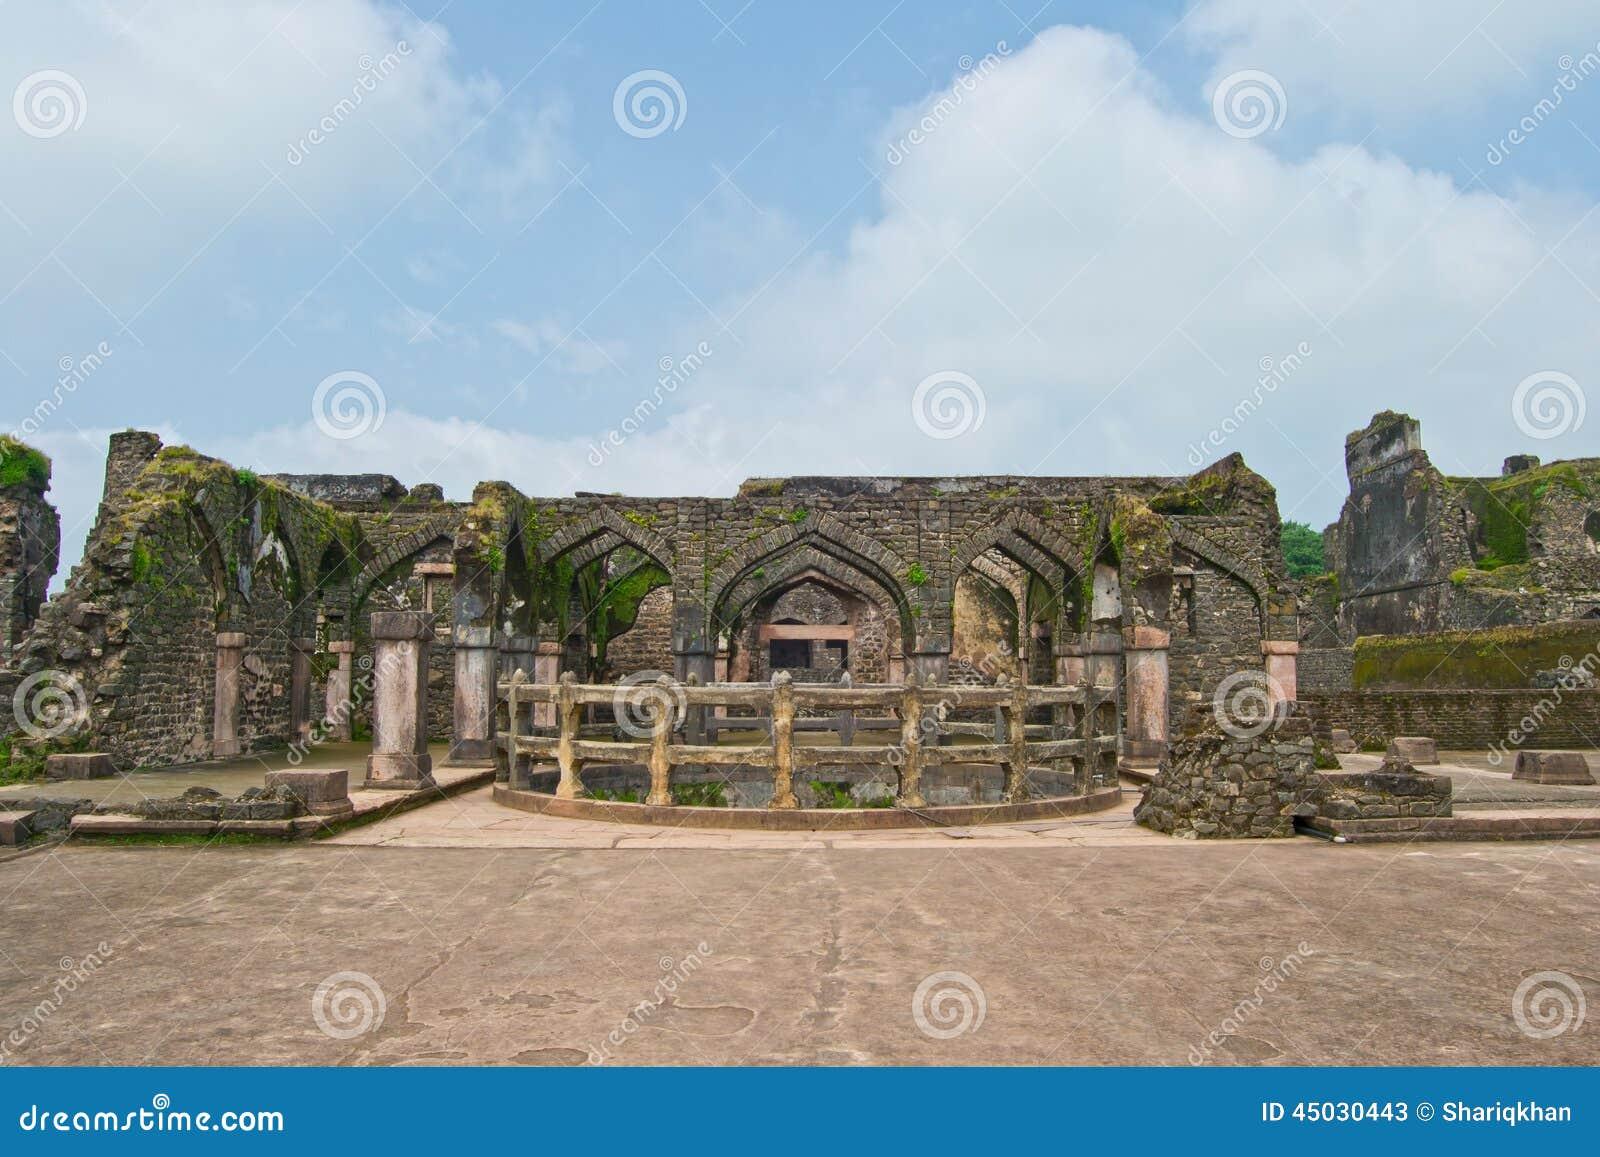 Ruins of Historic Architecture India